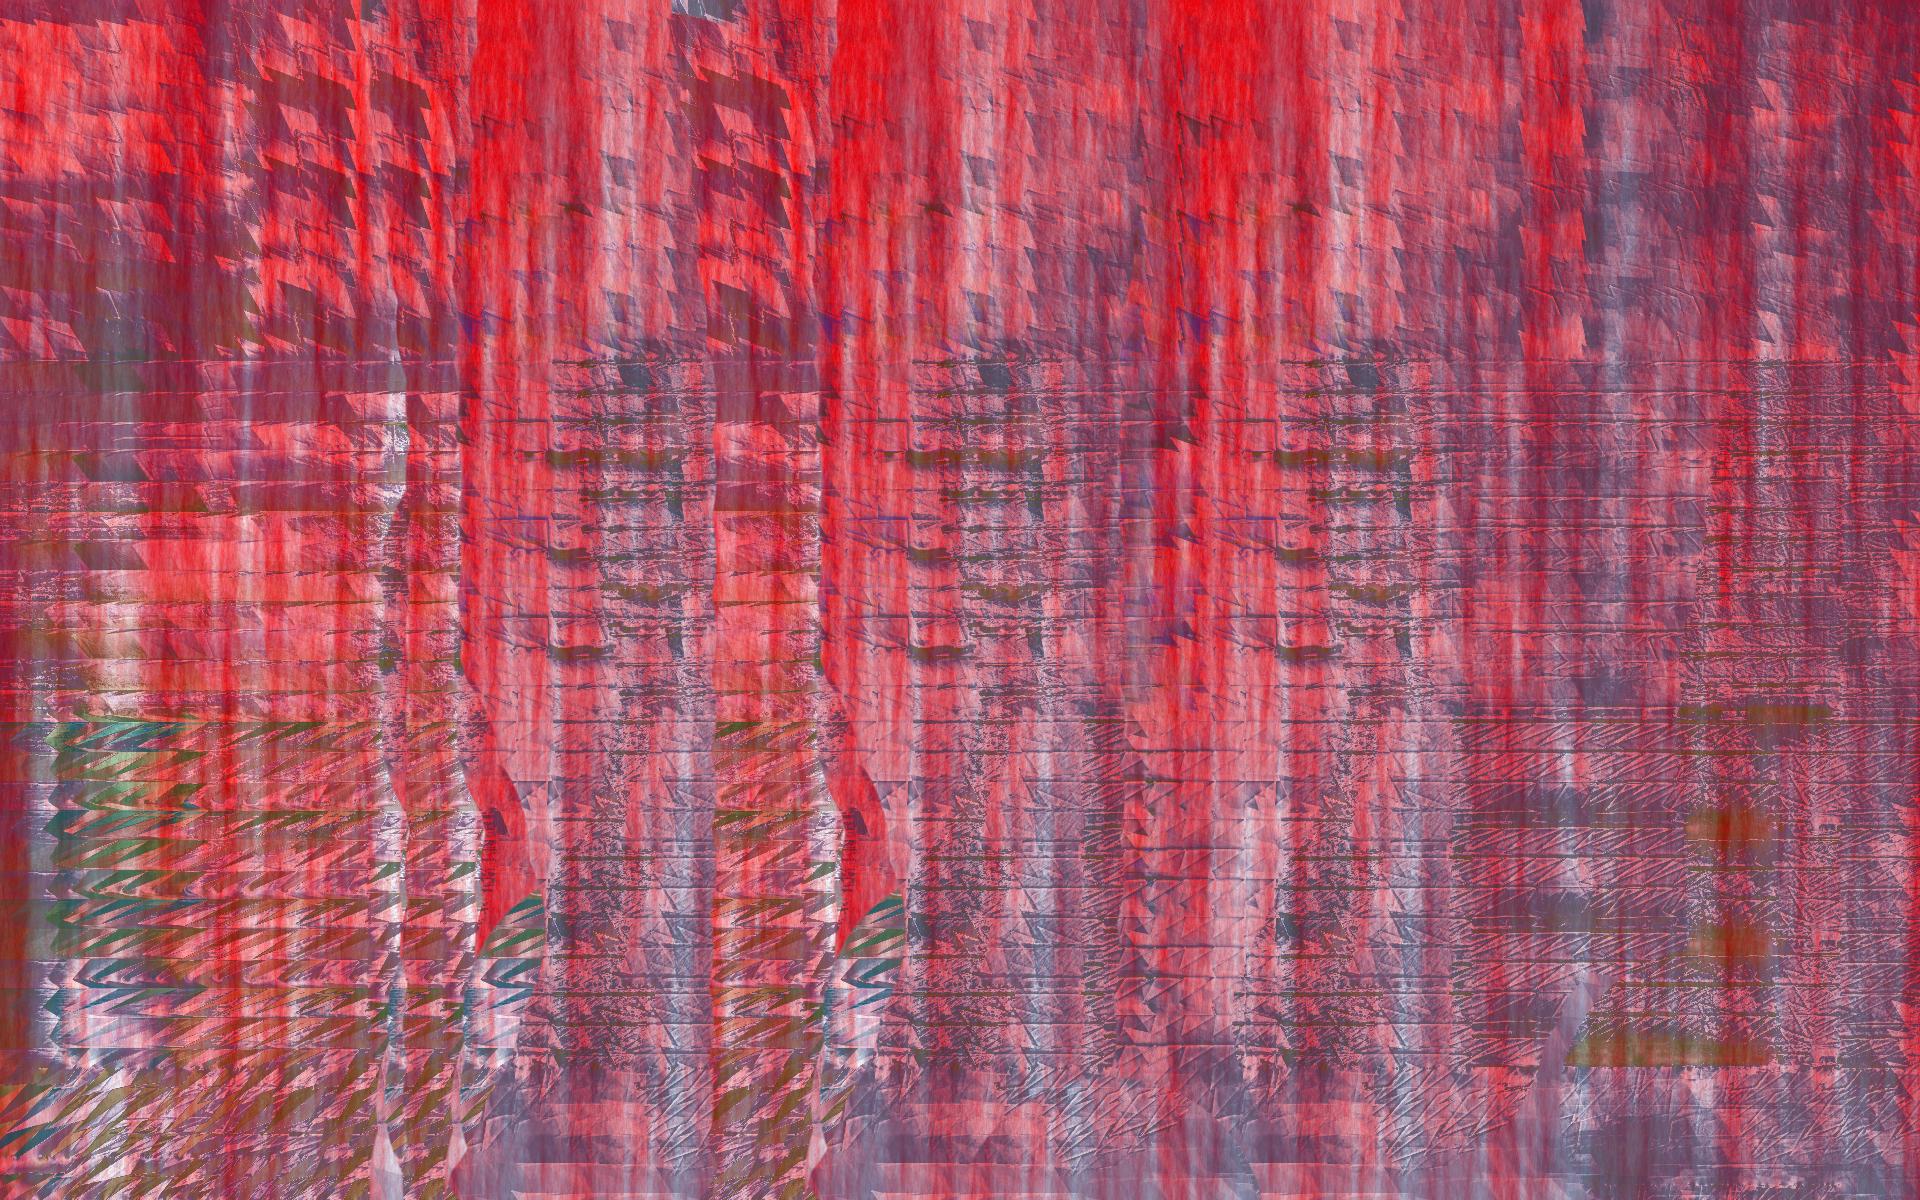 red glitch background